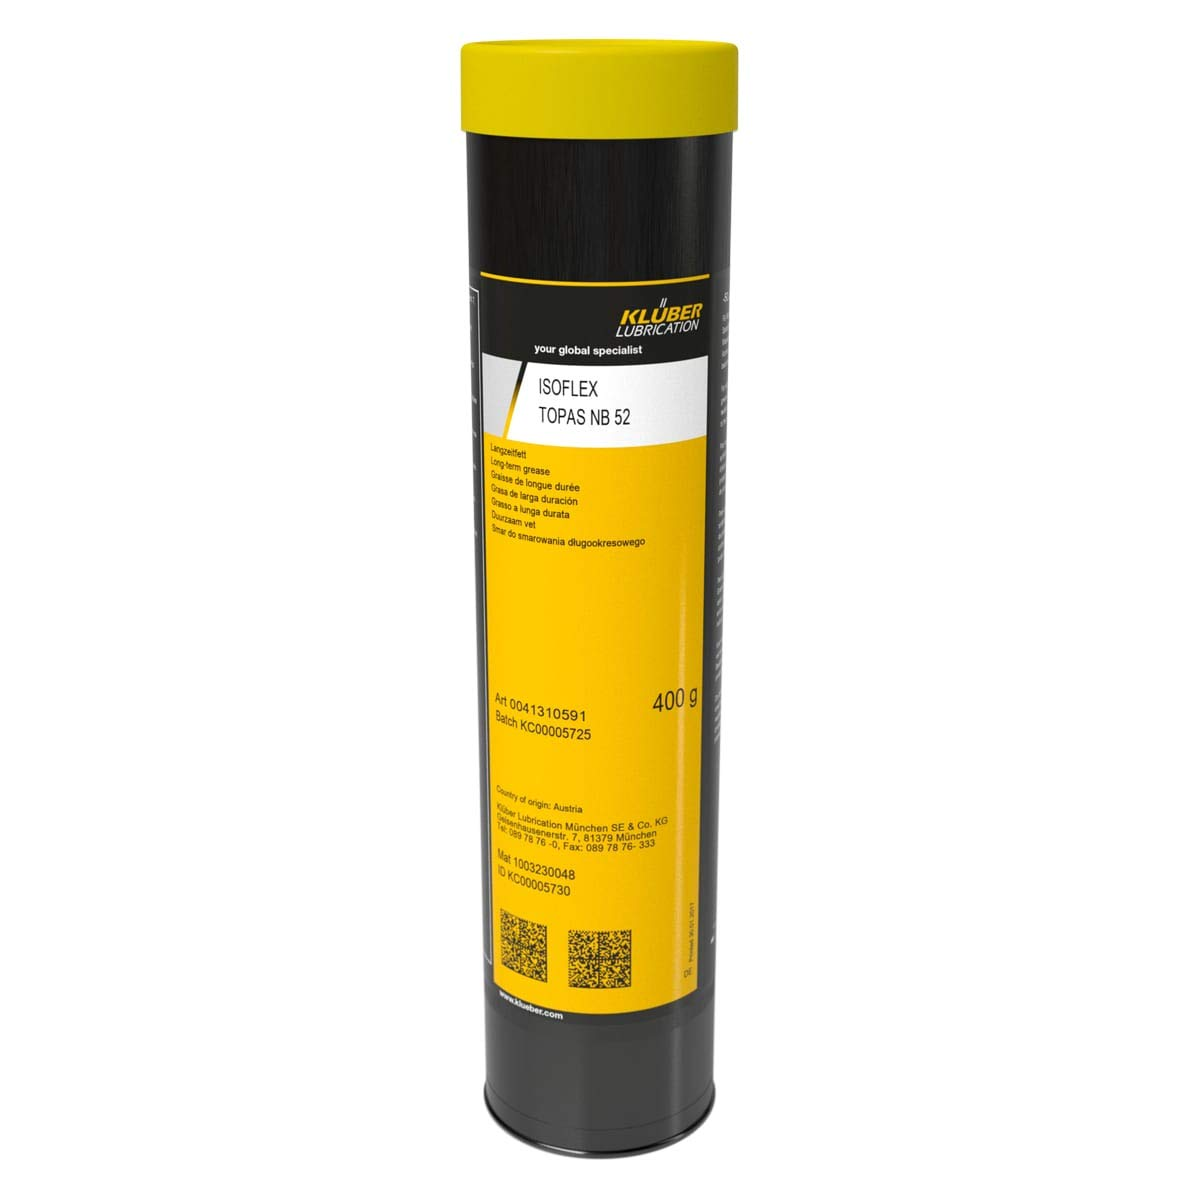 Kluber Lubrication Isoflex Topas Nb 52 400 grams  Synthetic